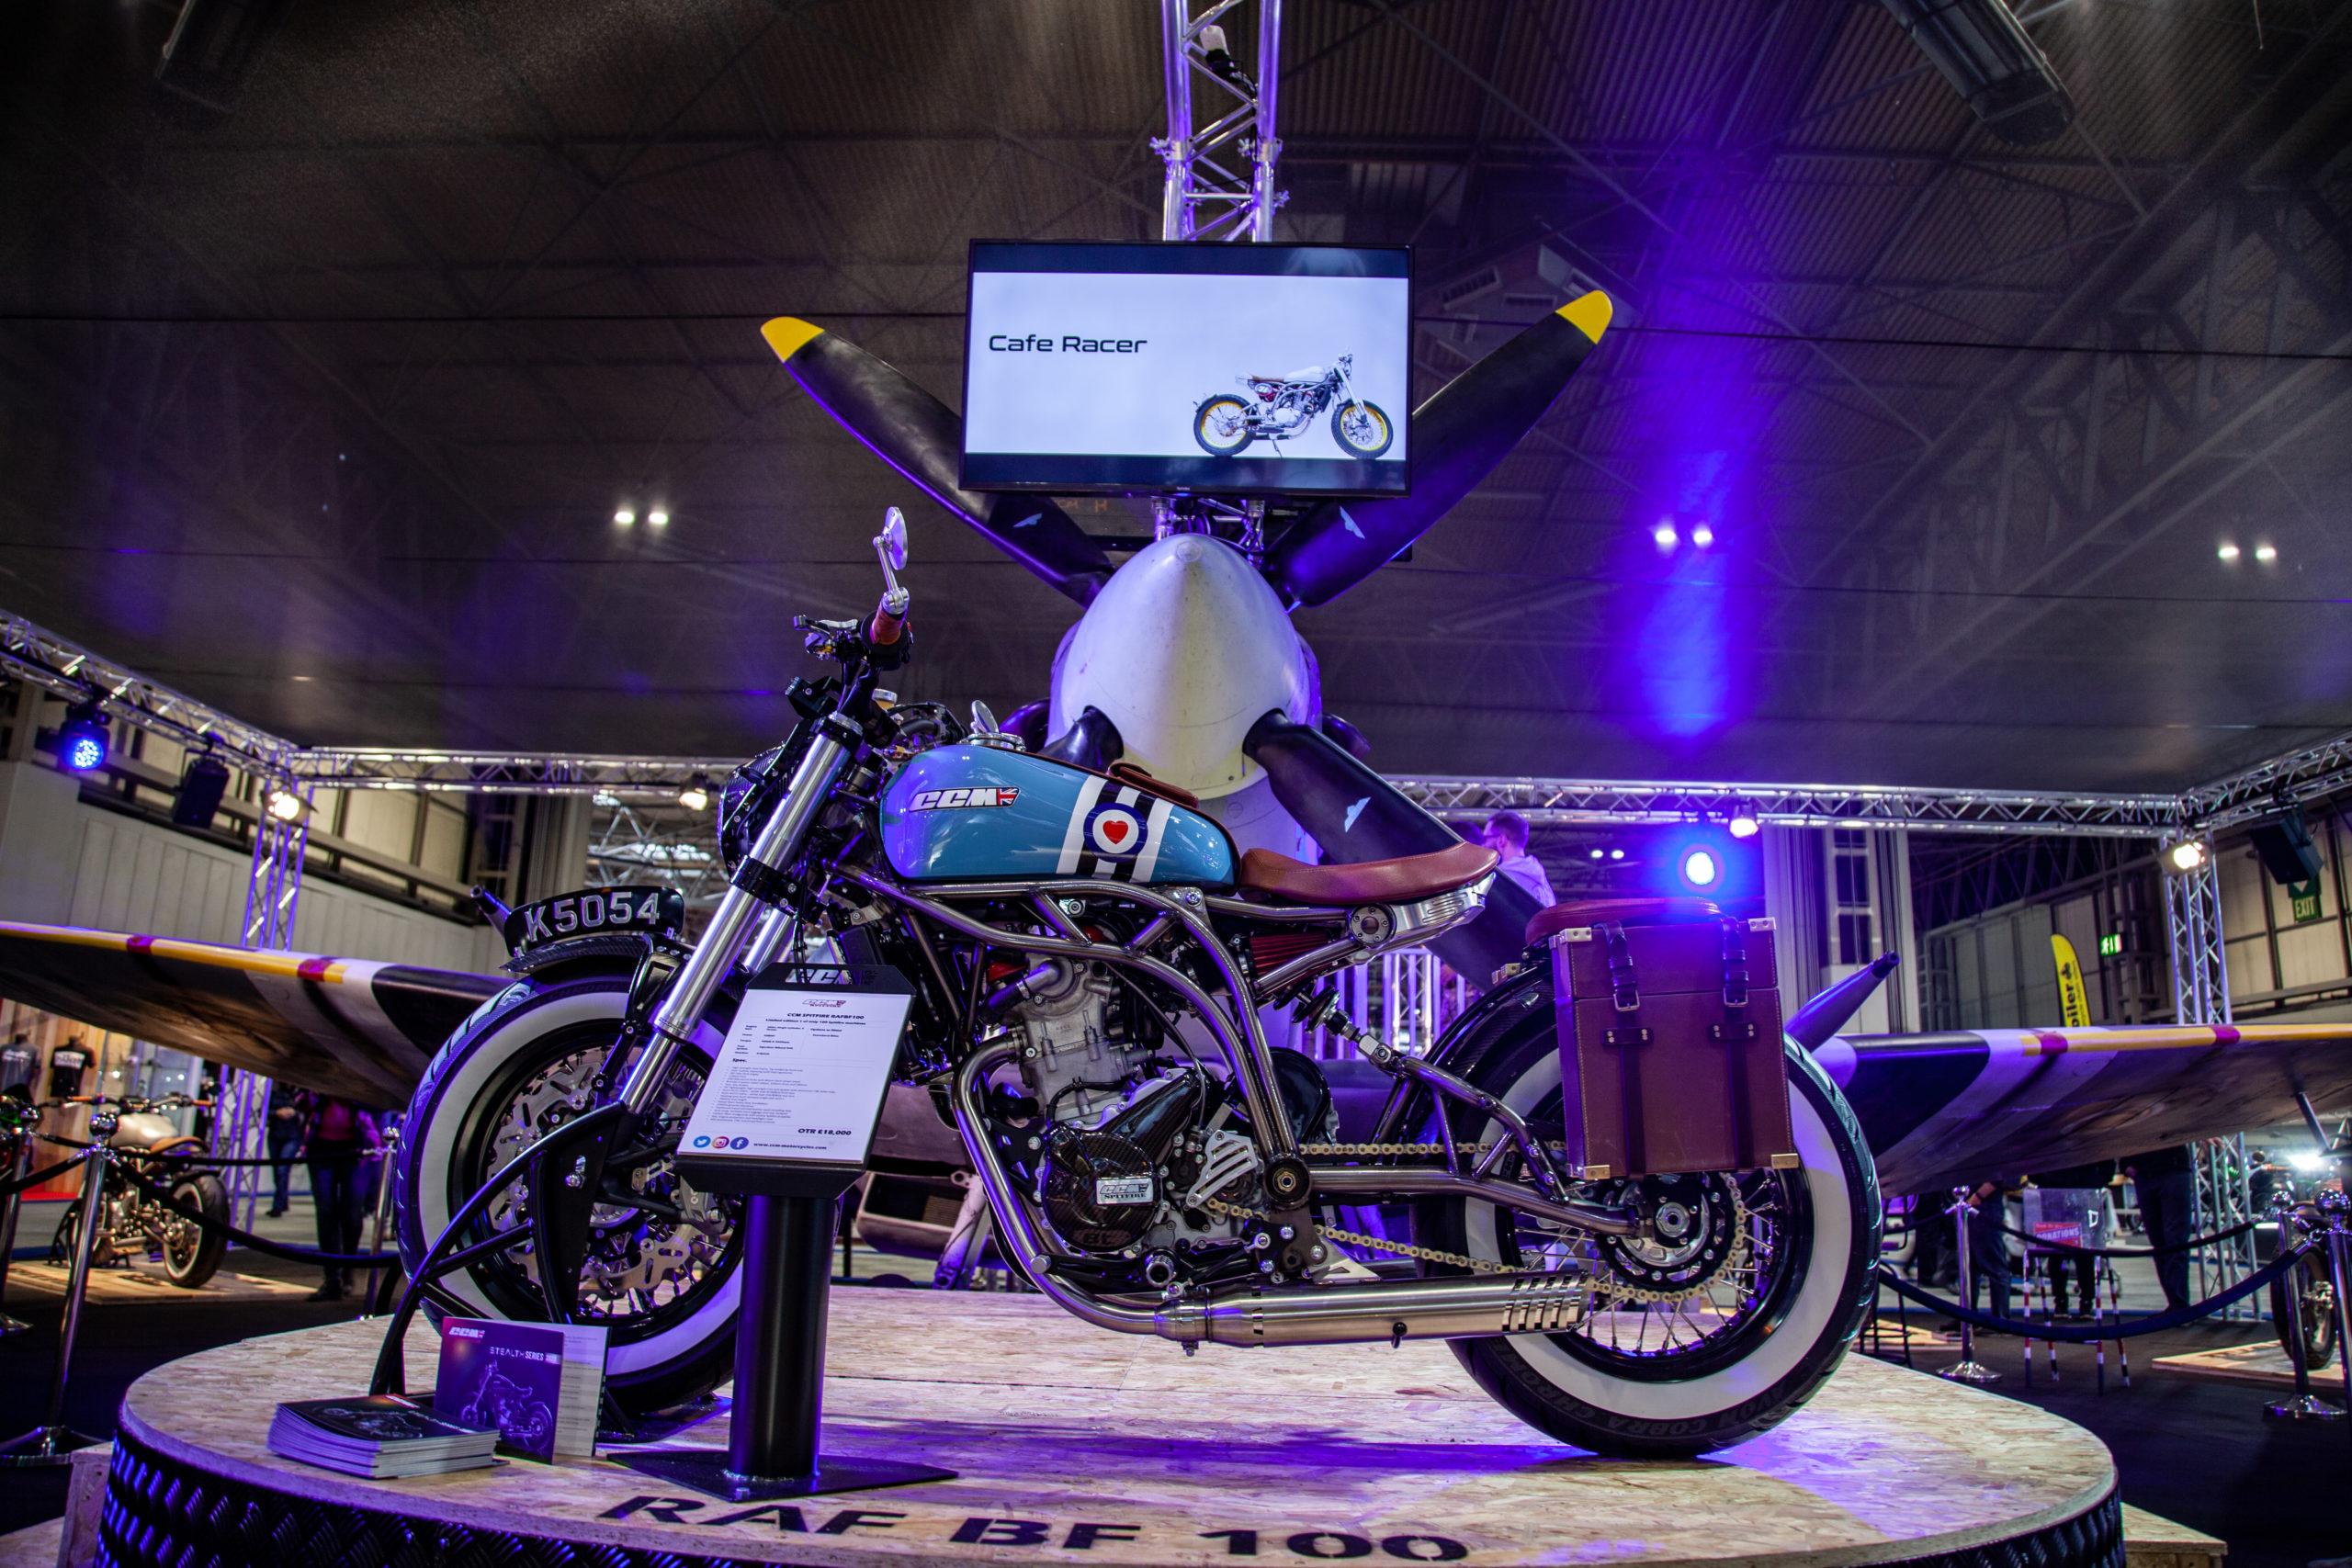 motorcycle live 2019 cafe racer ccm display 2